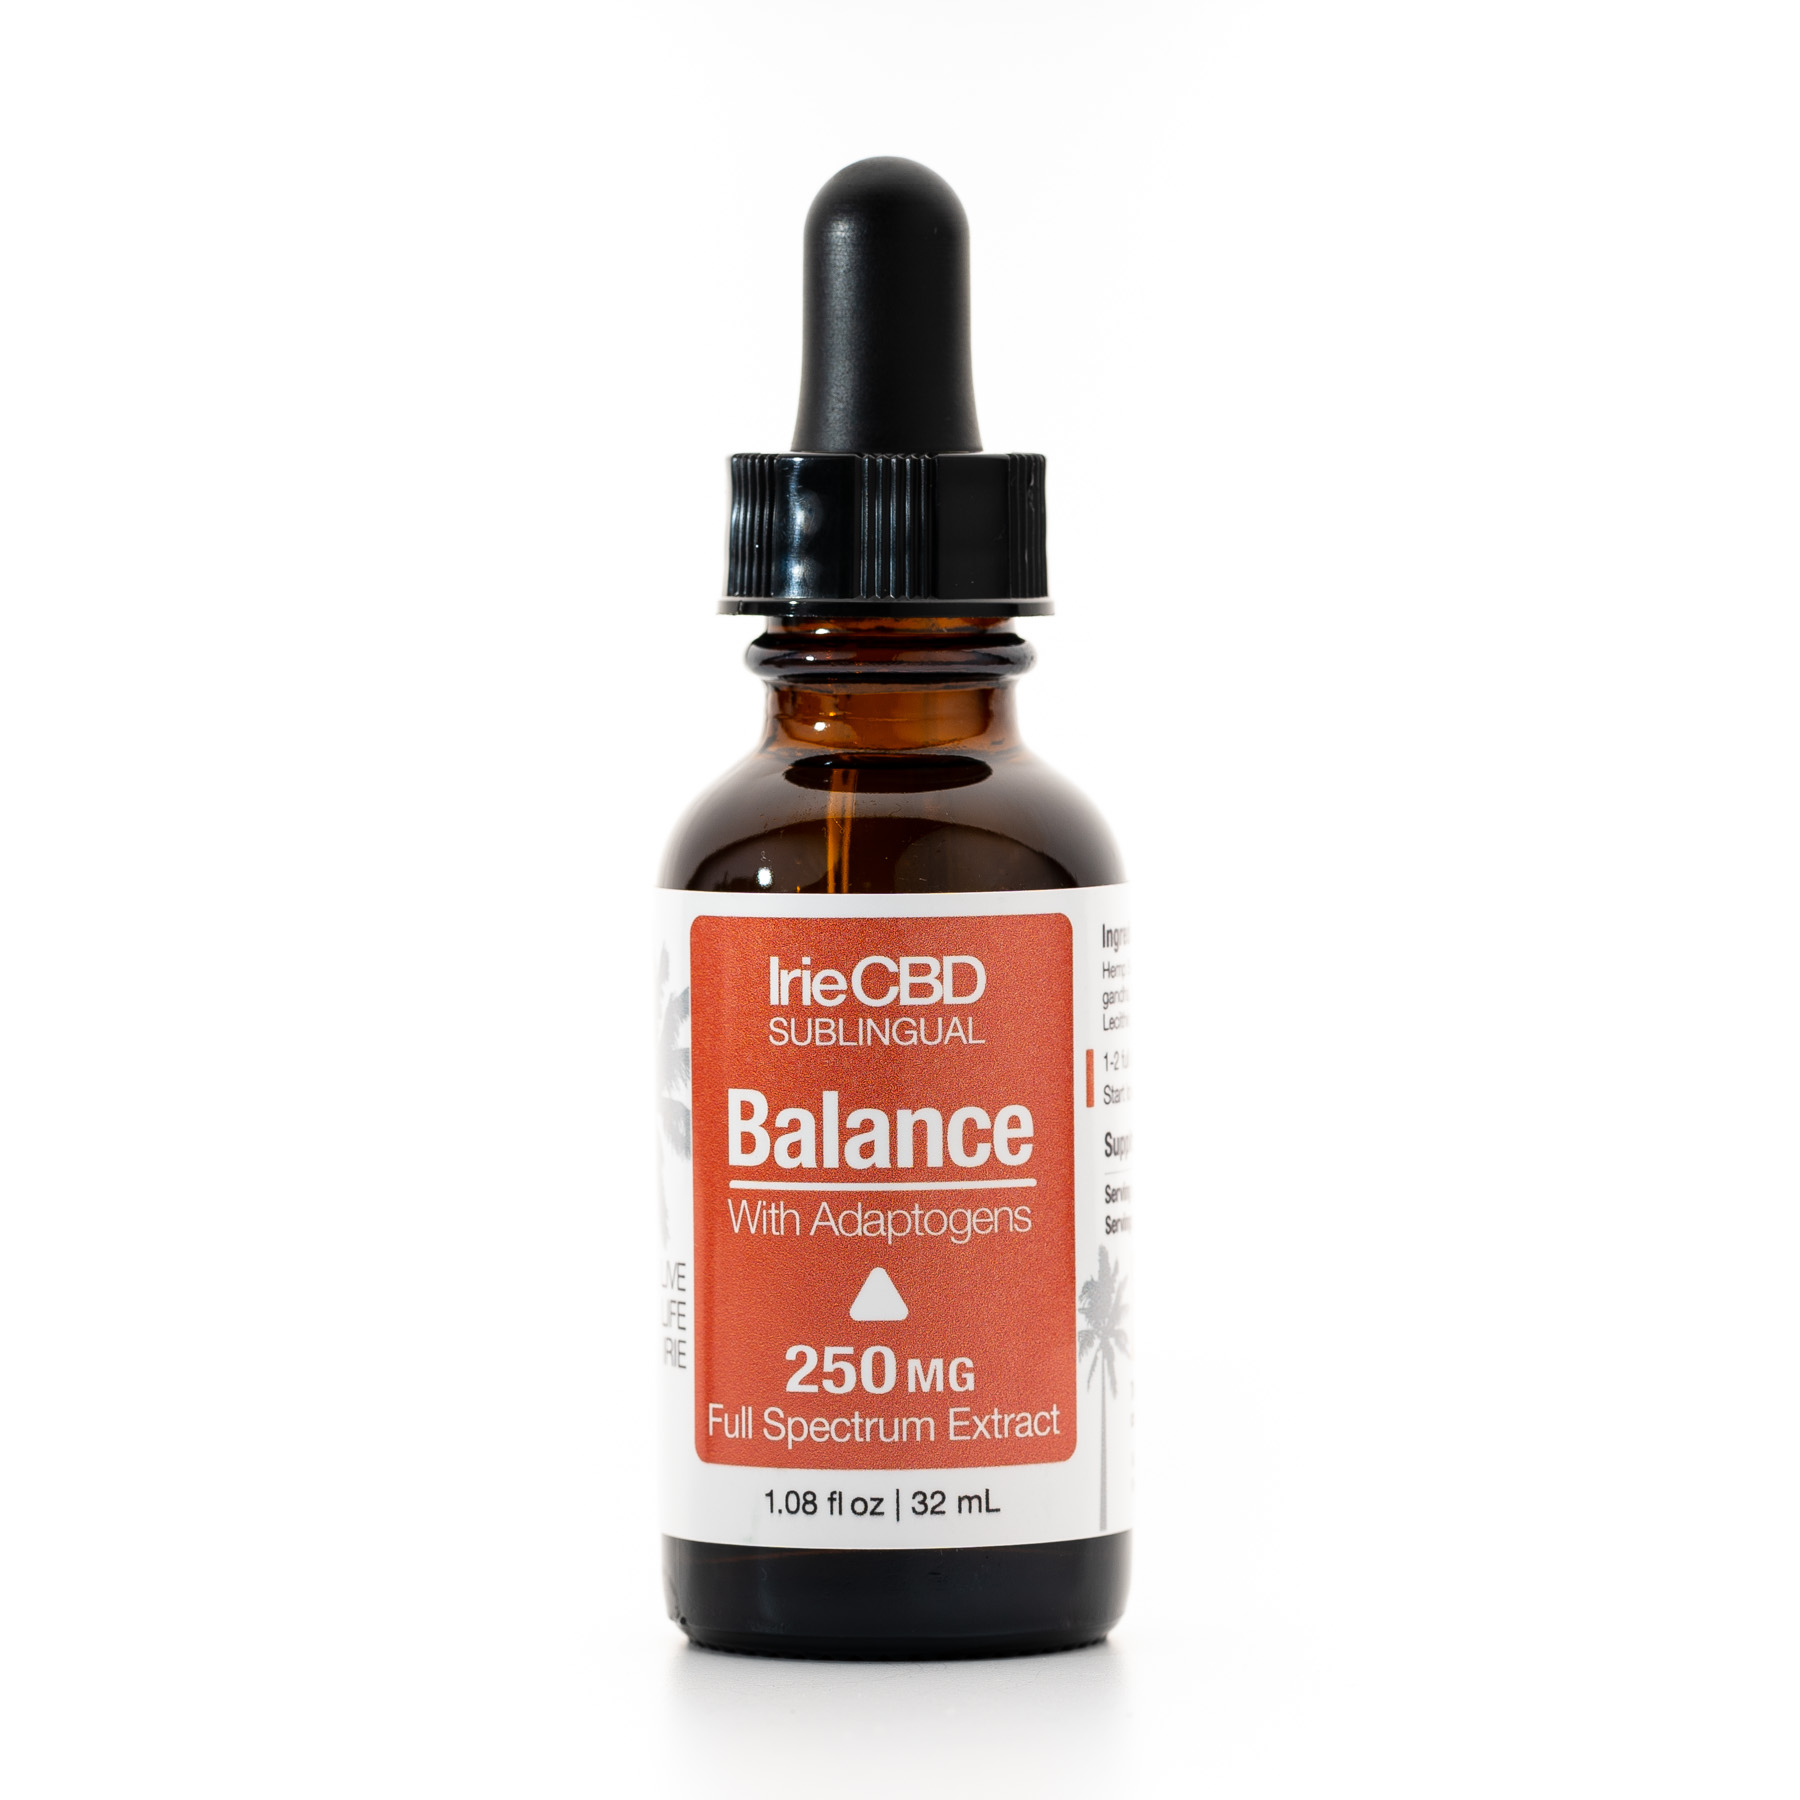 Balance 250mg CBD Oil Tincture Irie CBD